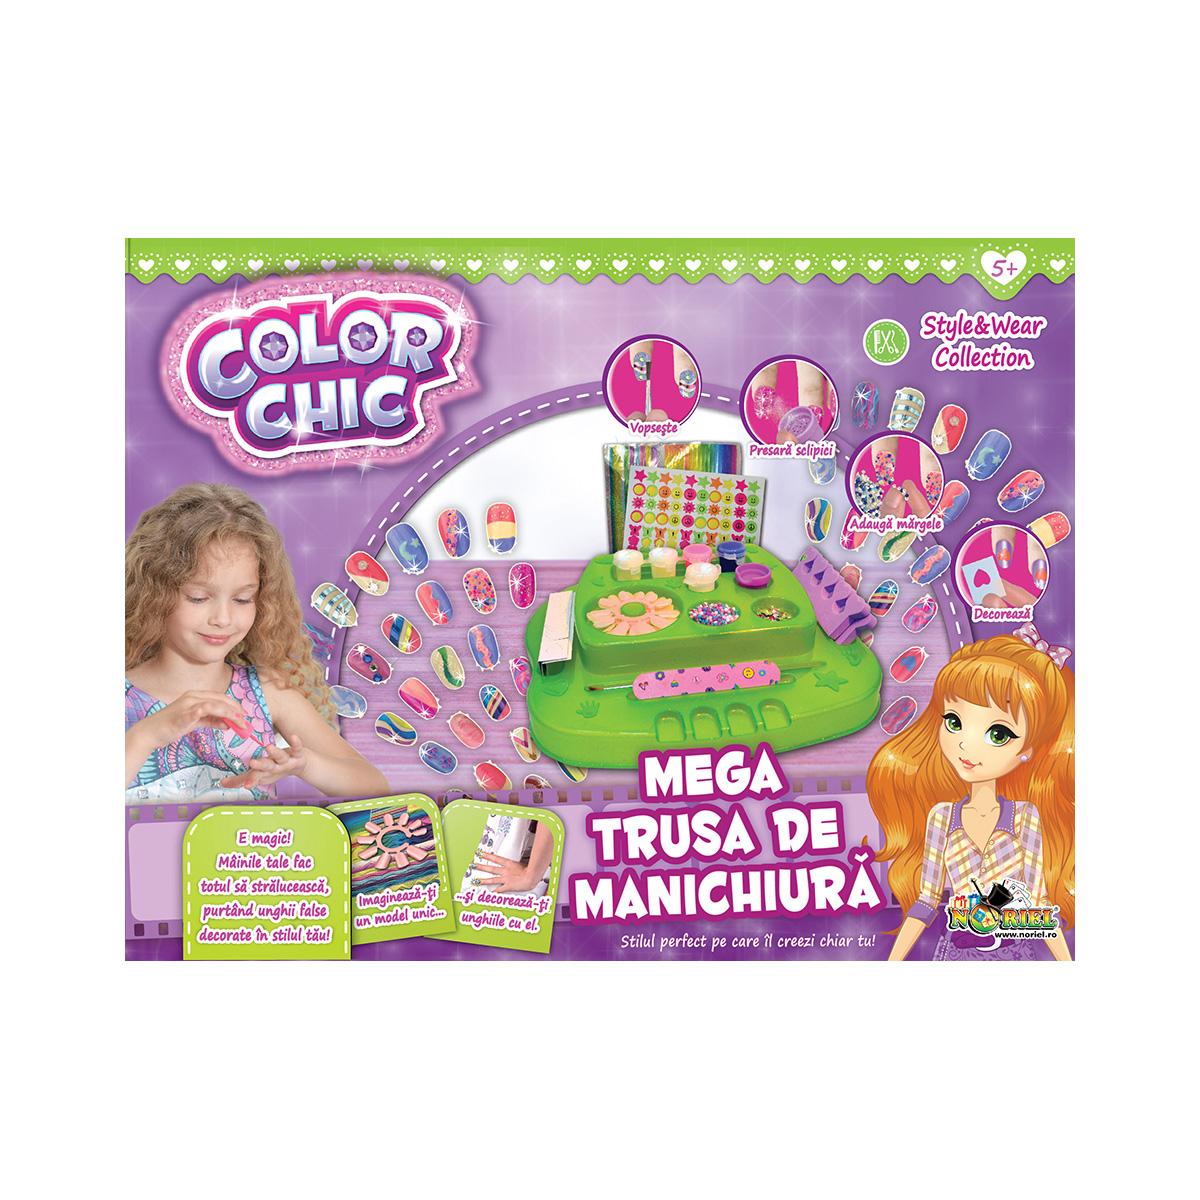 Color Chic - Mega Trusa de manichiura